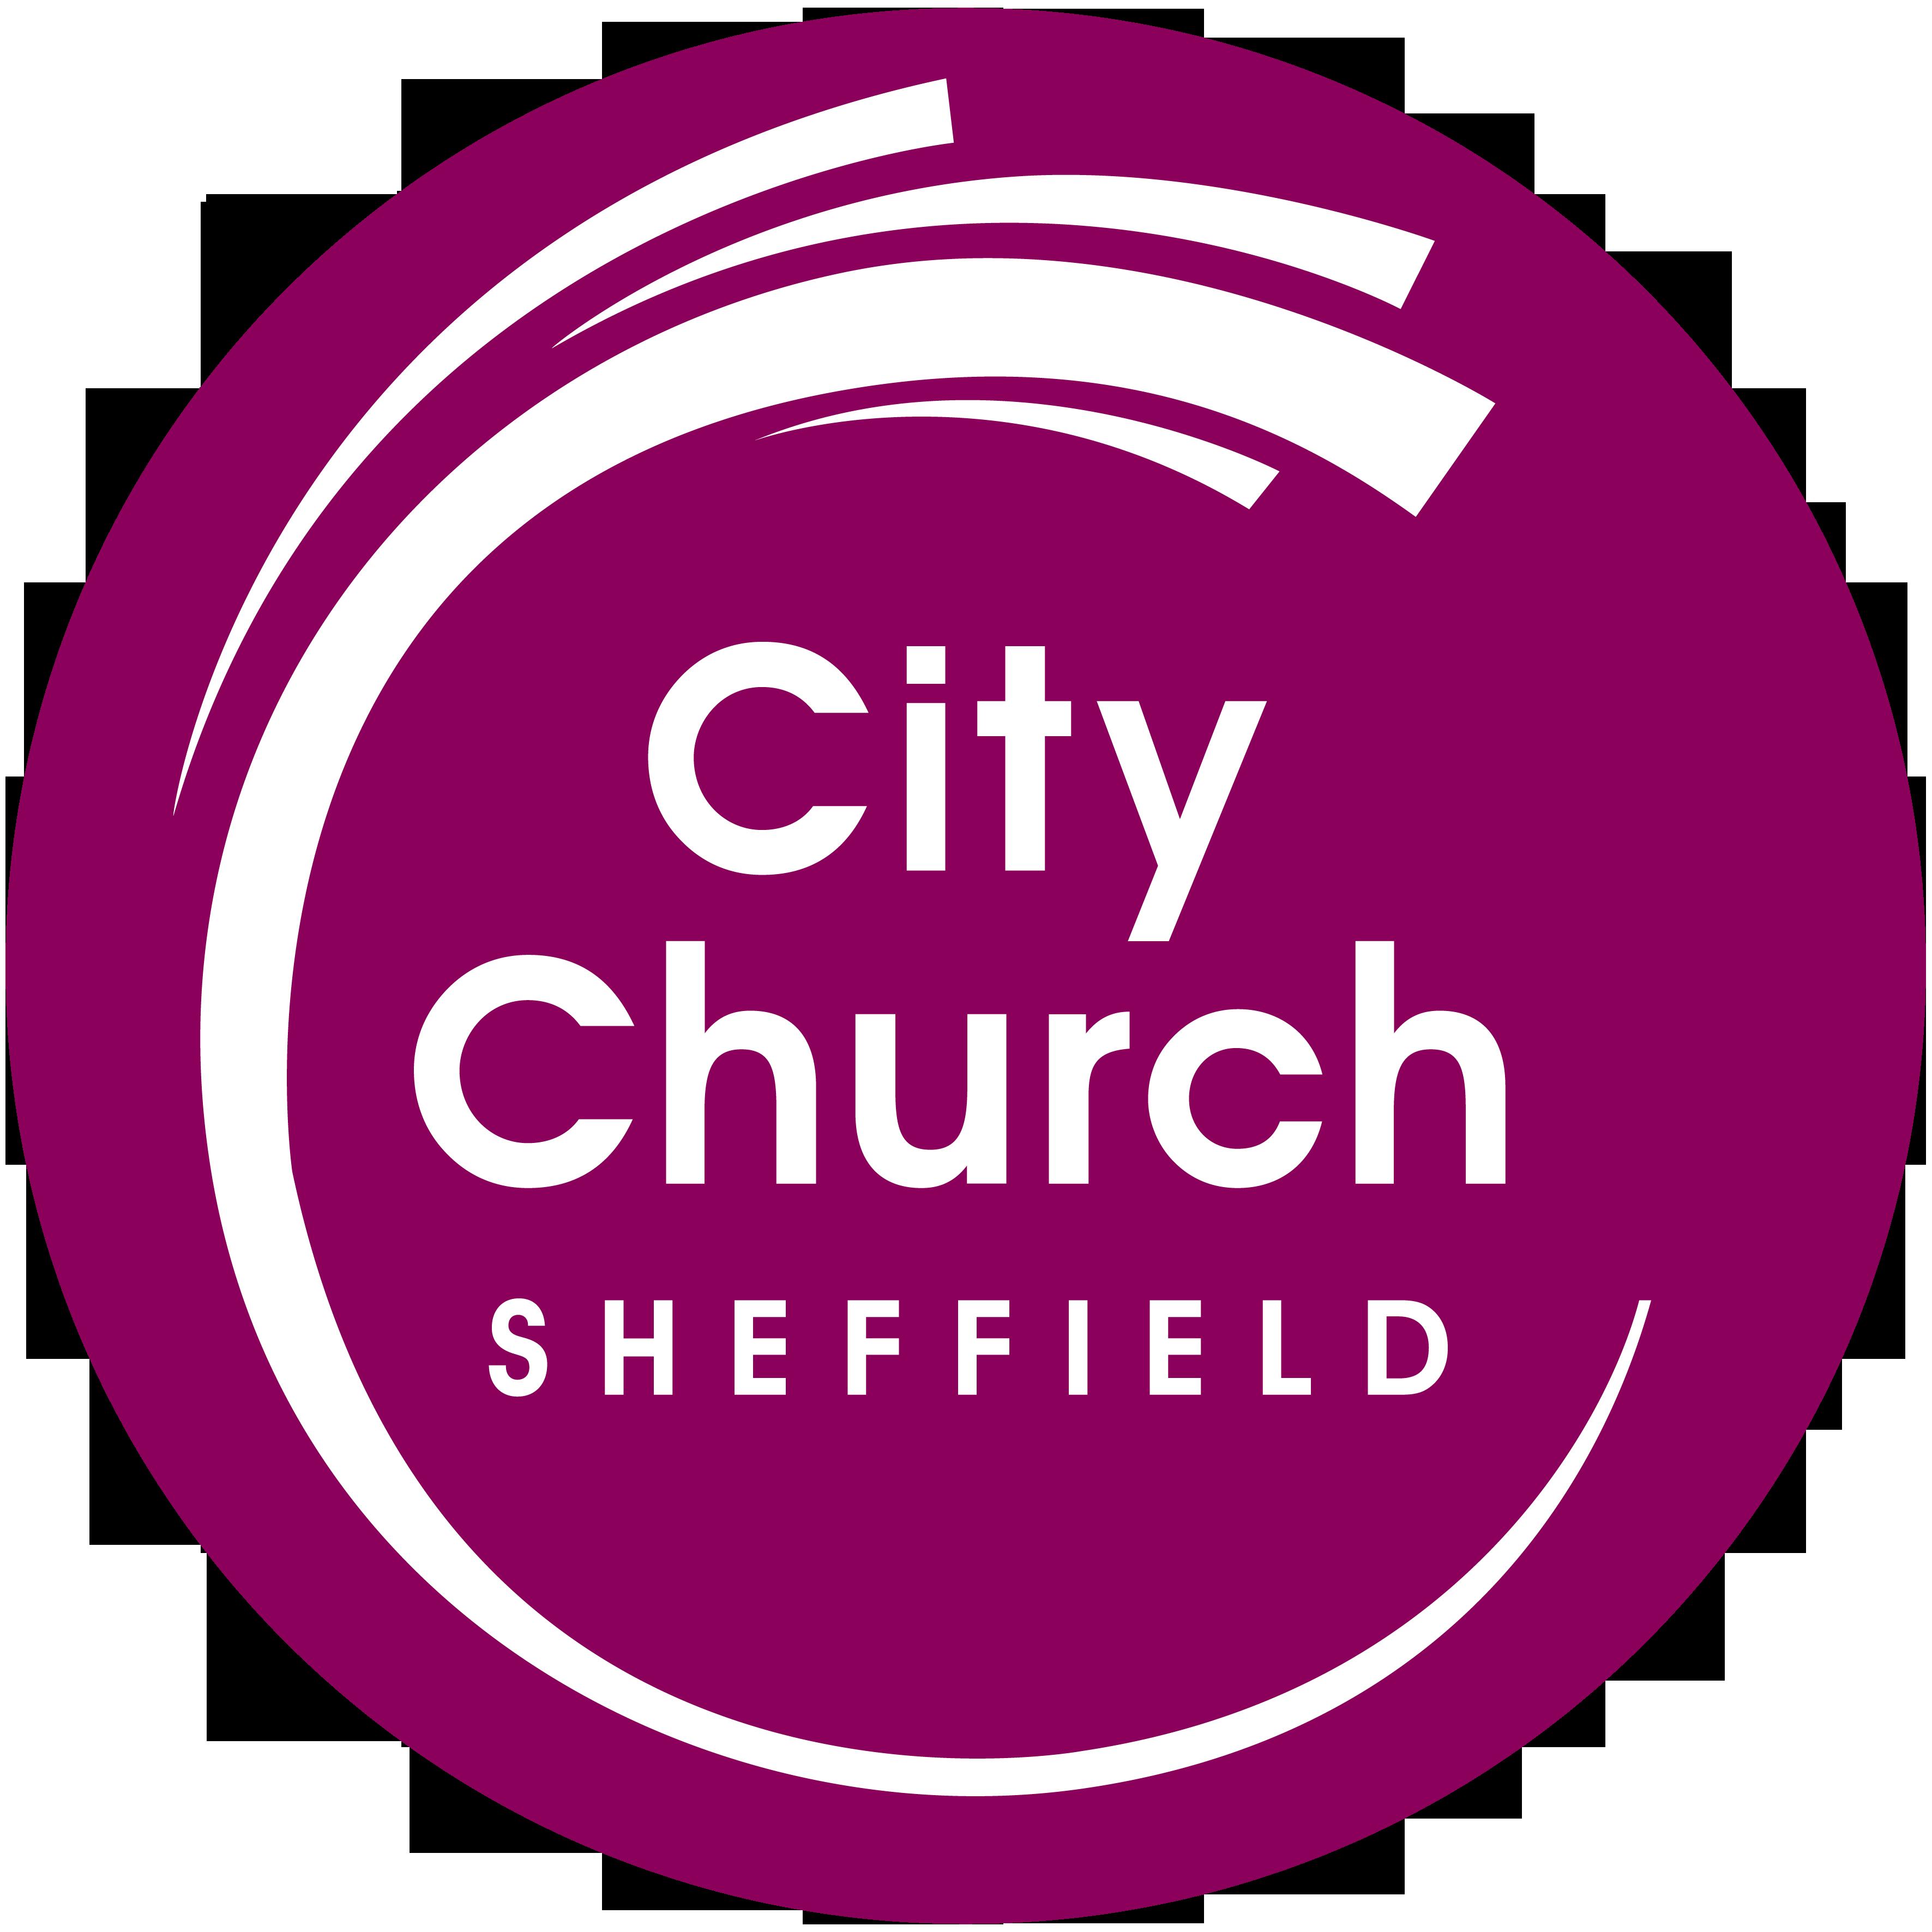 City Church Sheffield